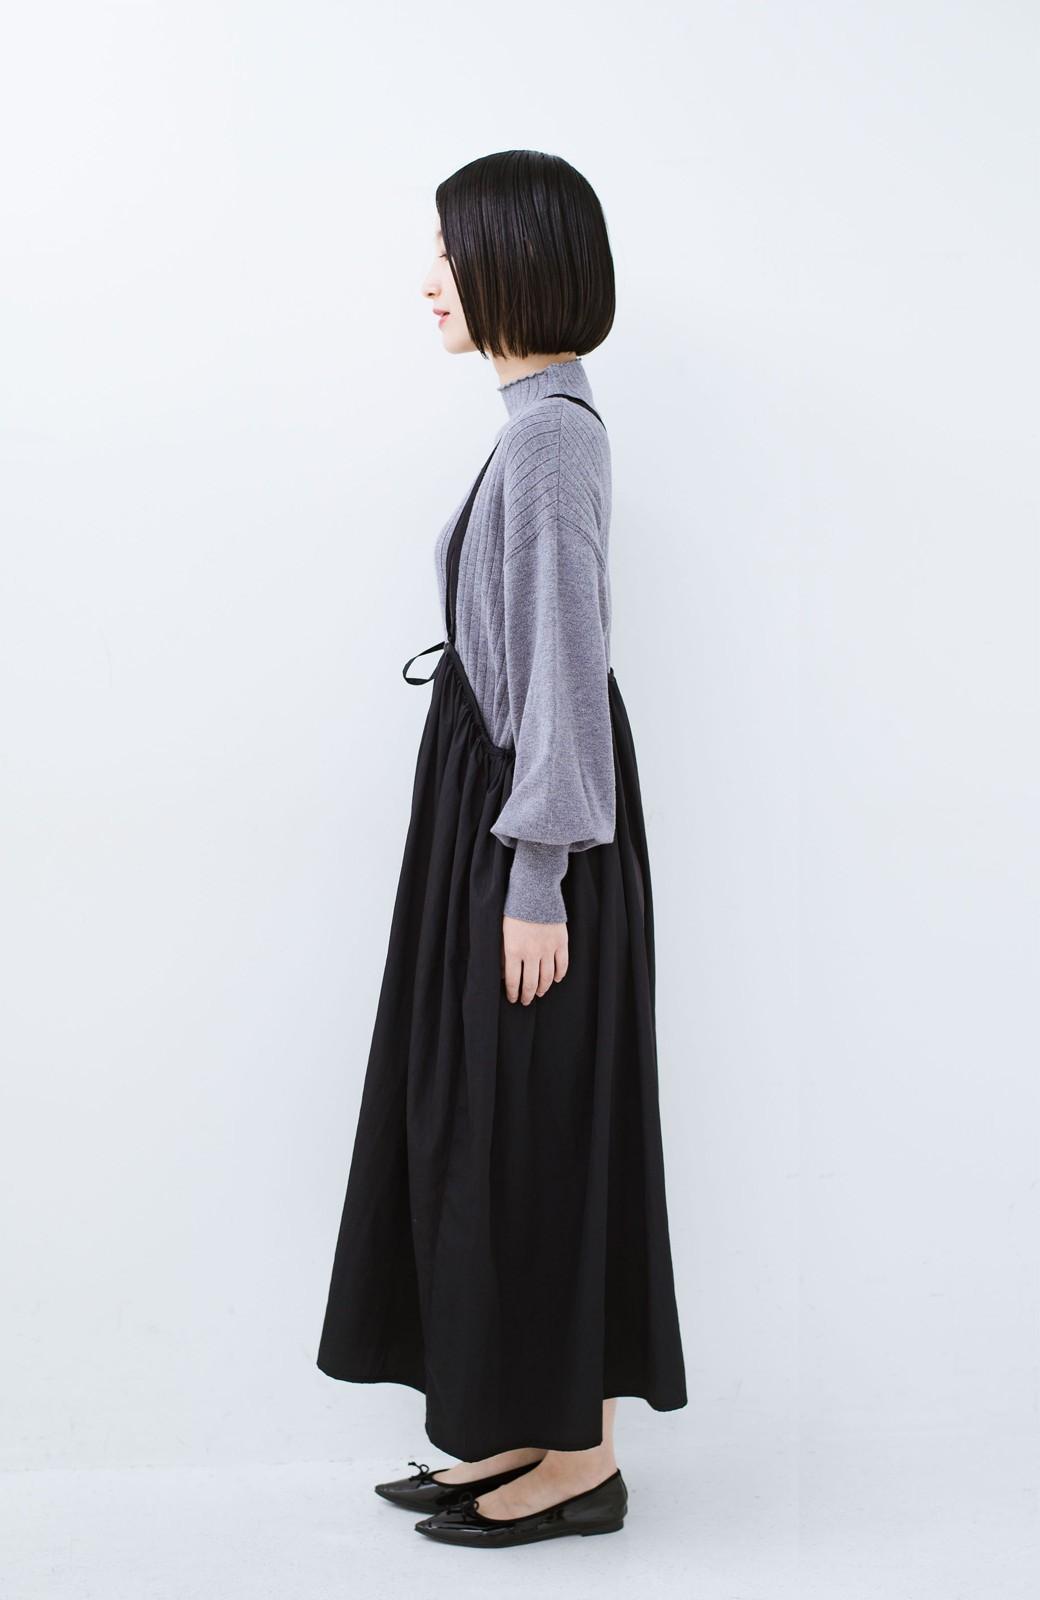 haco! 女の子バンザイ!プロジェクト【ブルー期】 ニットですら重ね着できる安心さ ゆったりギャザーキャミワンピ <ブラック>の商品写真16